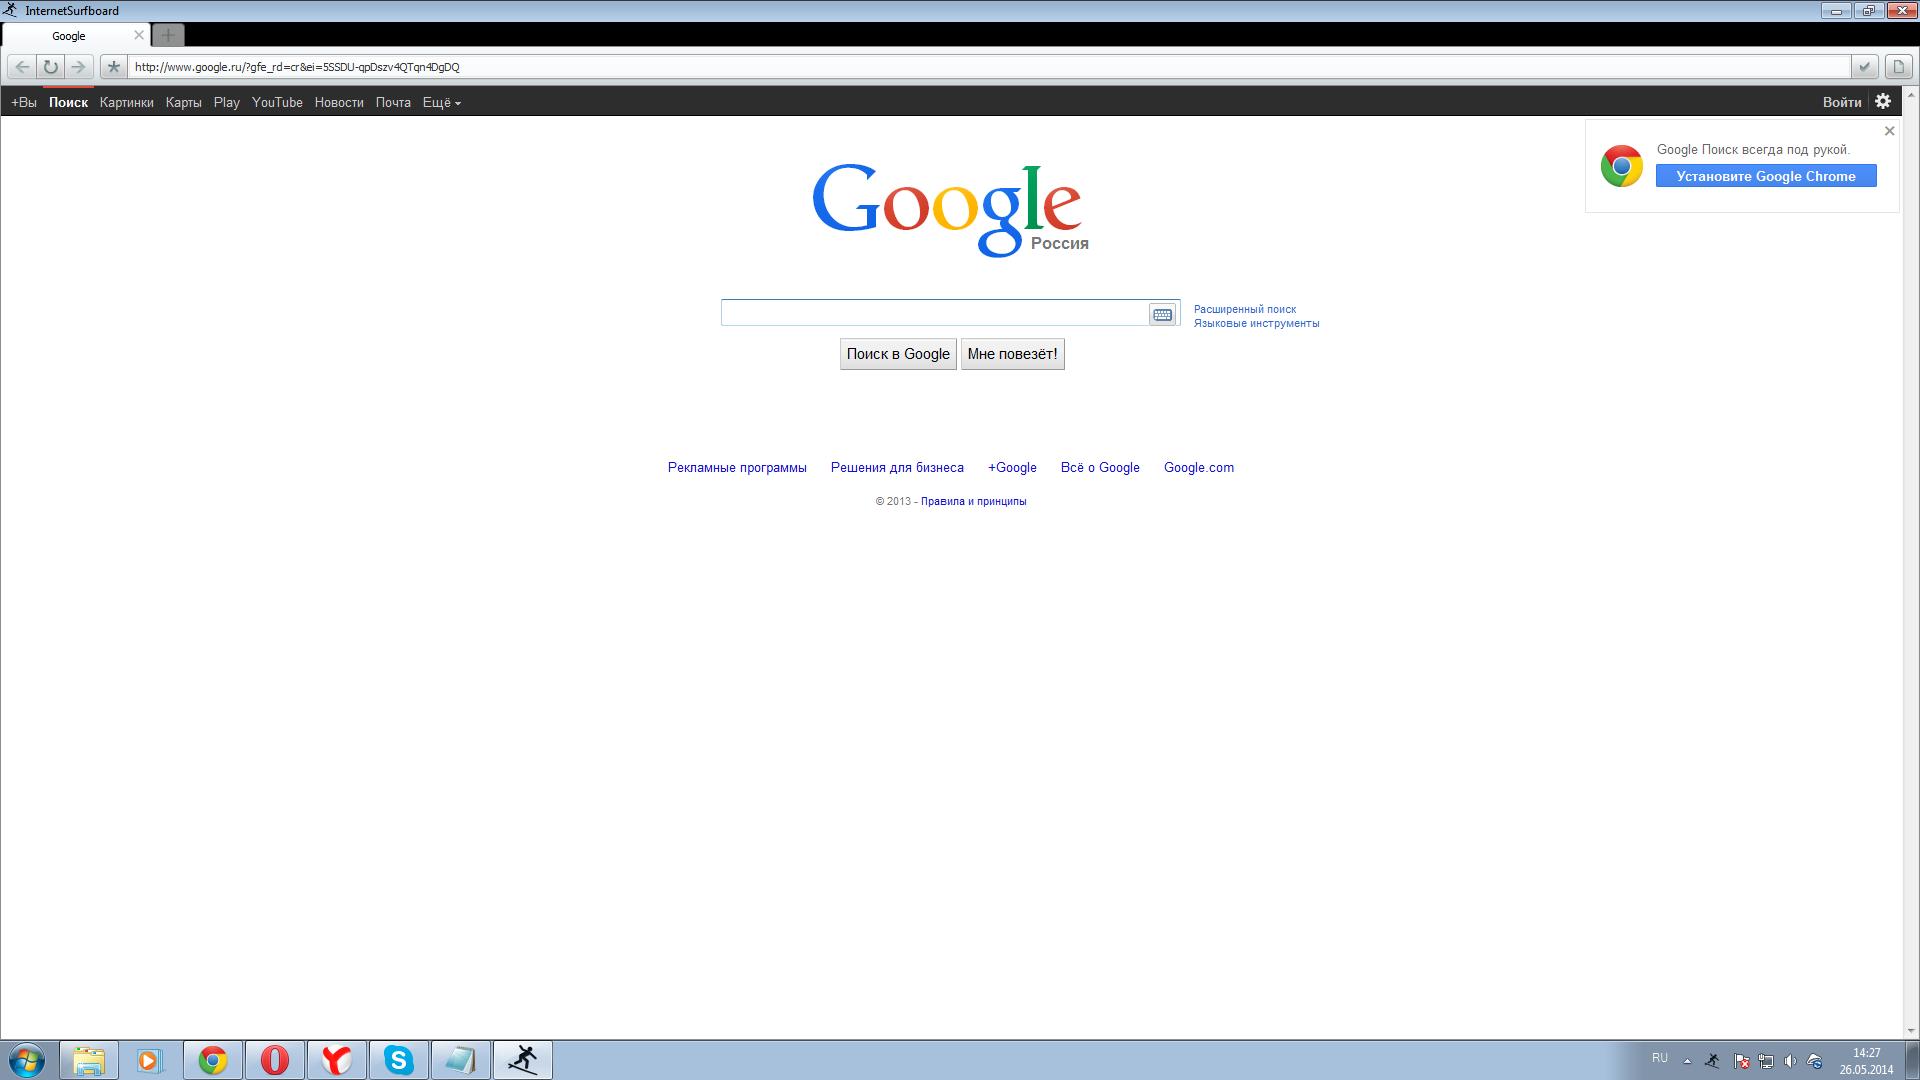 Список все браузеры Interner Surfboard